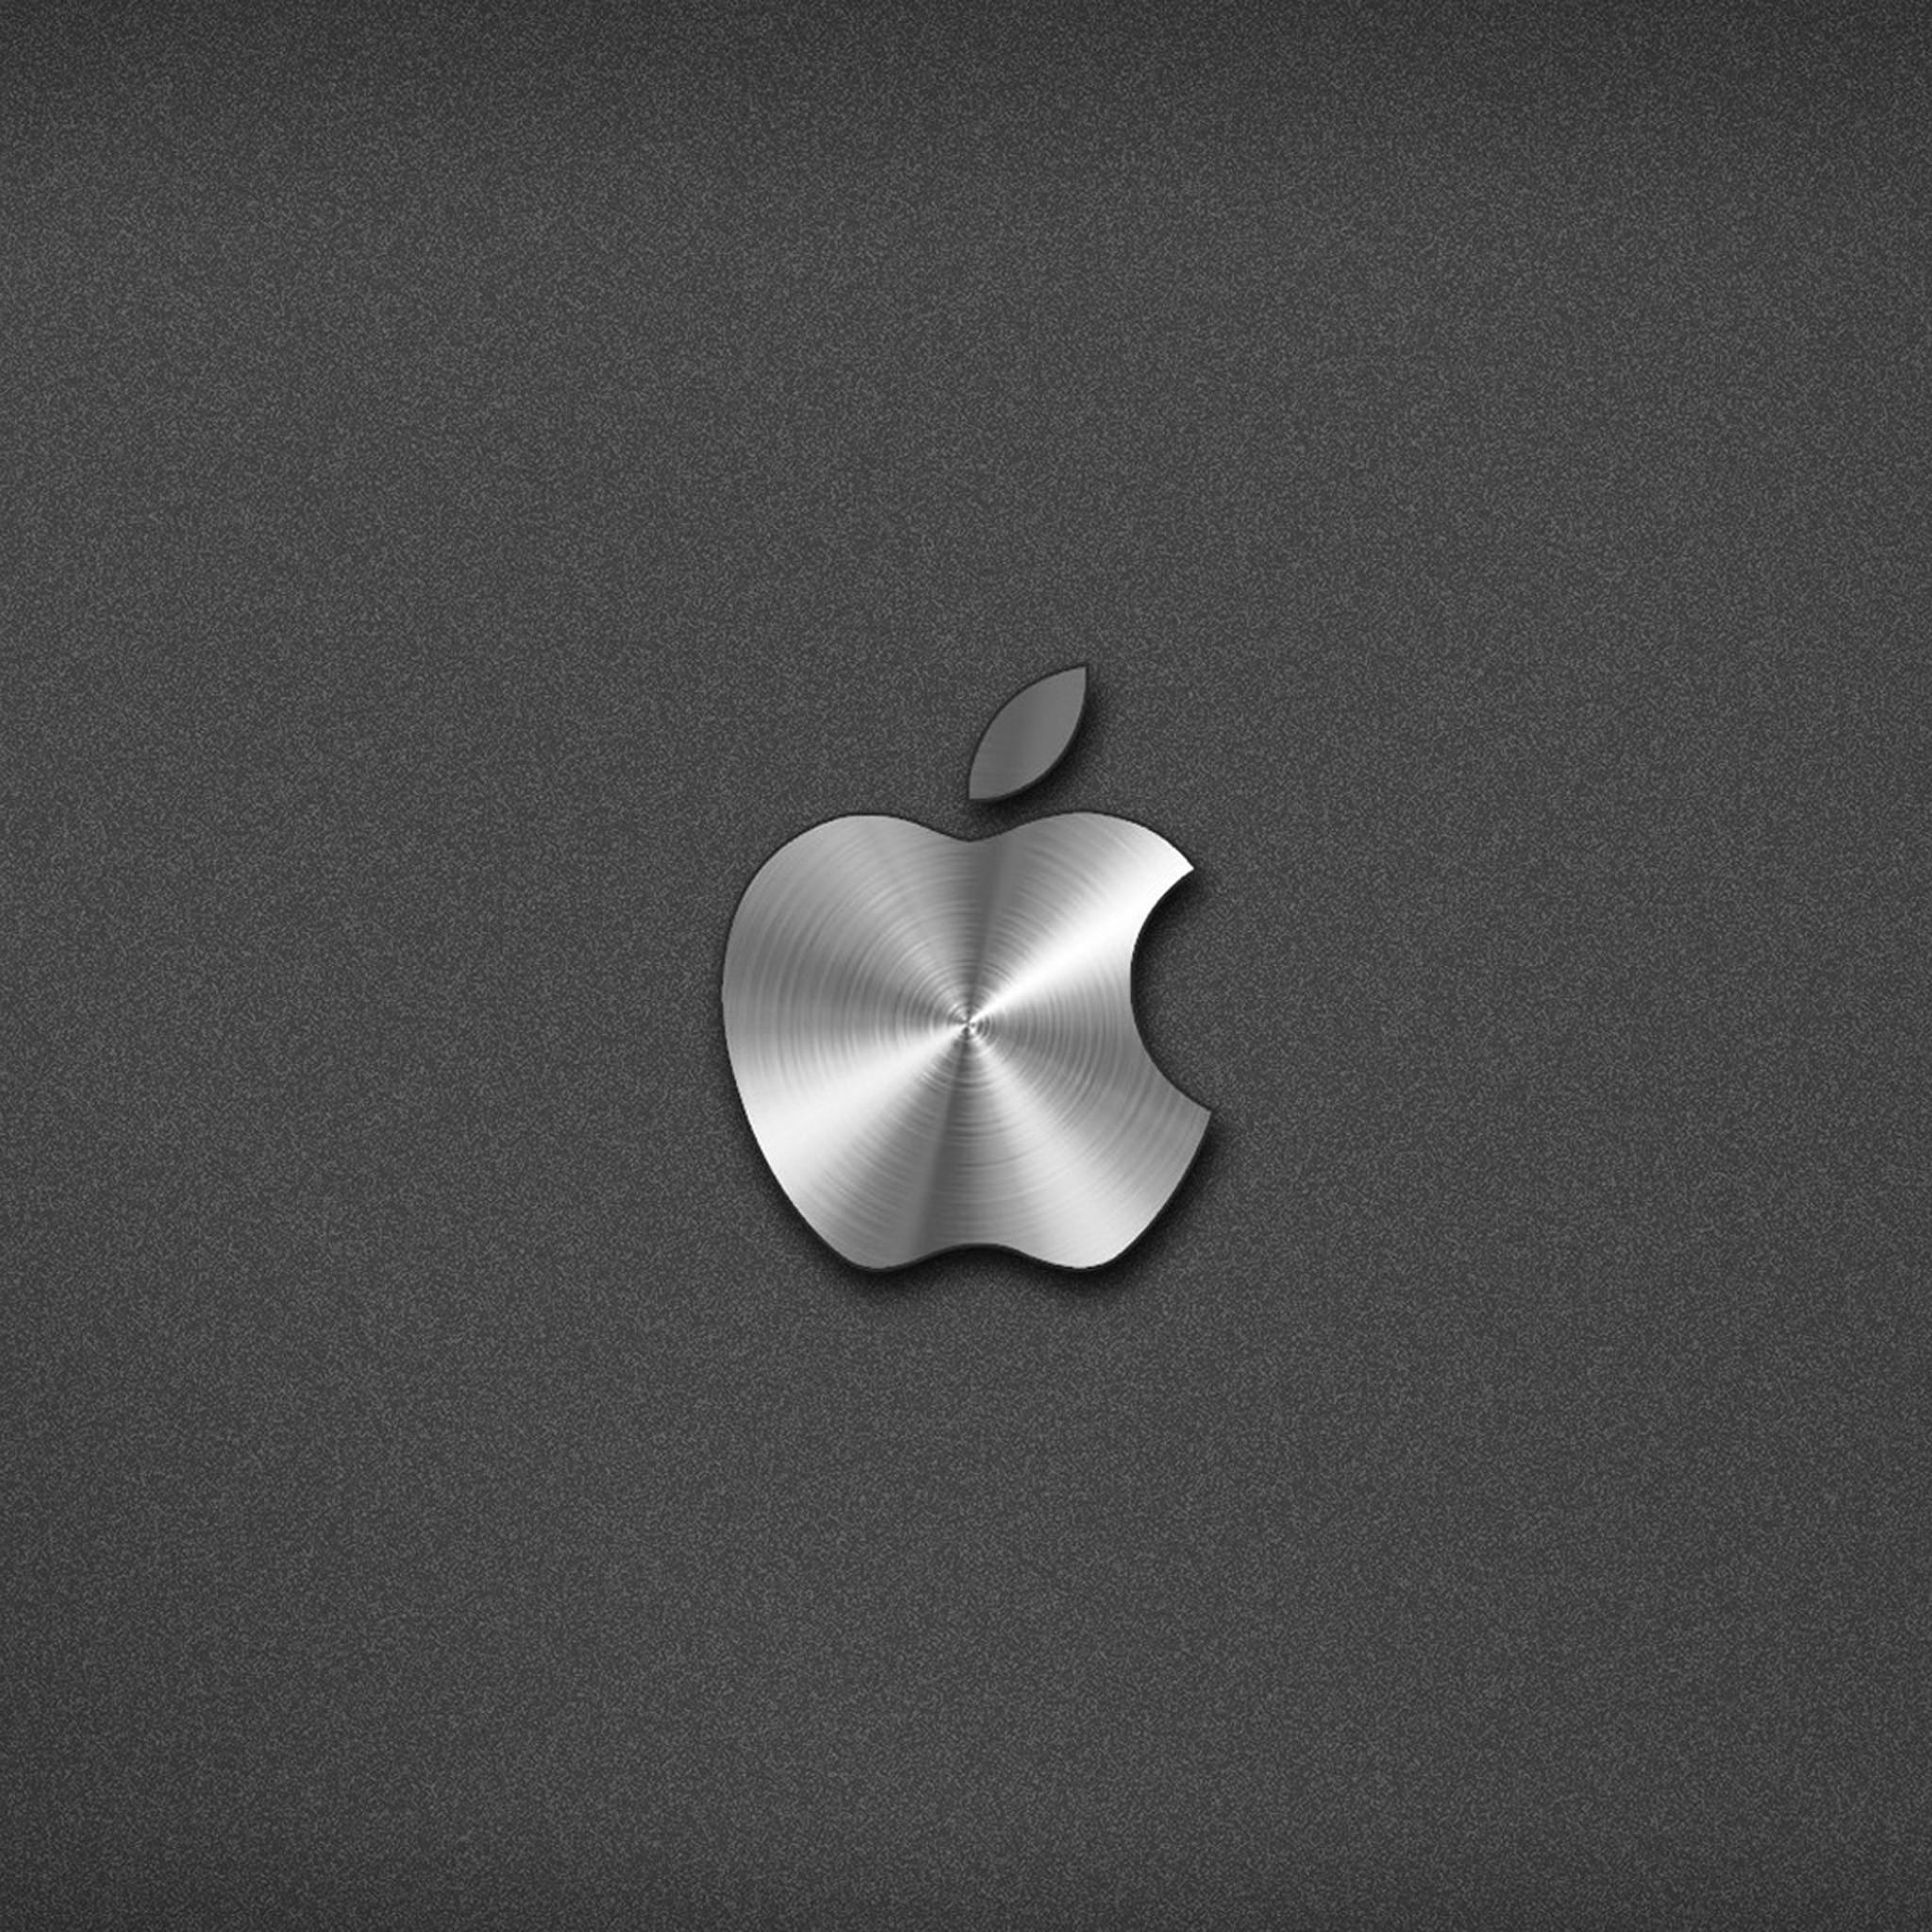 Metal Apple Wallpaper 71 Images